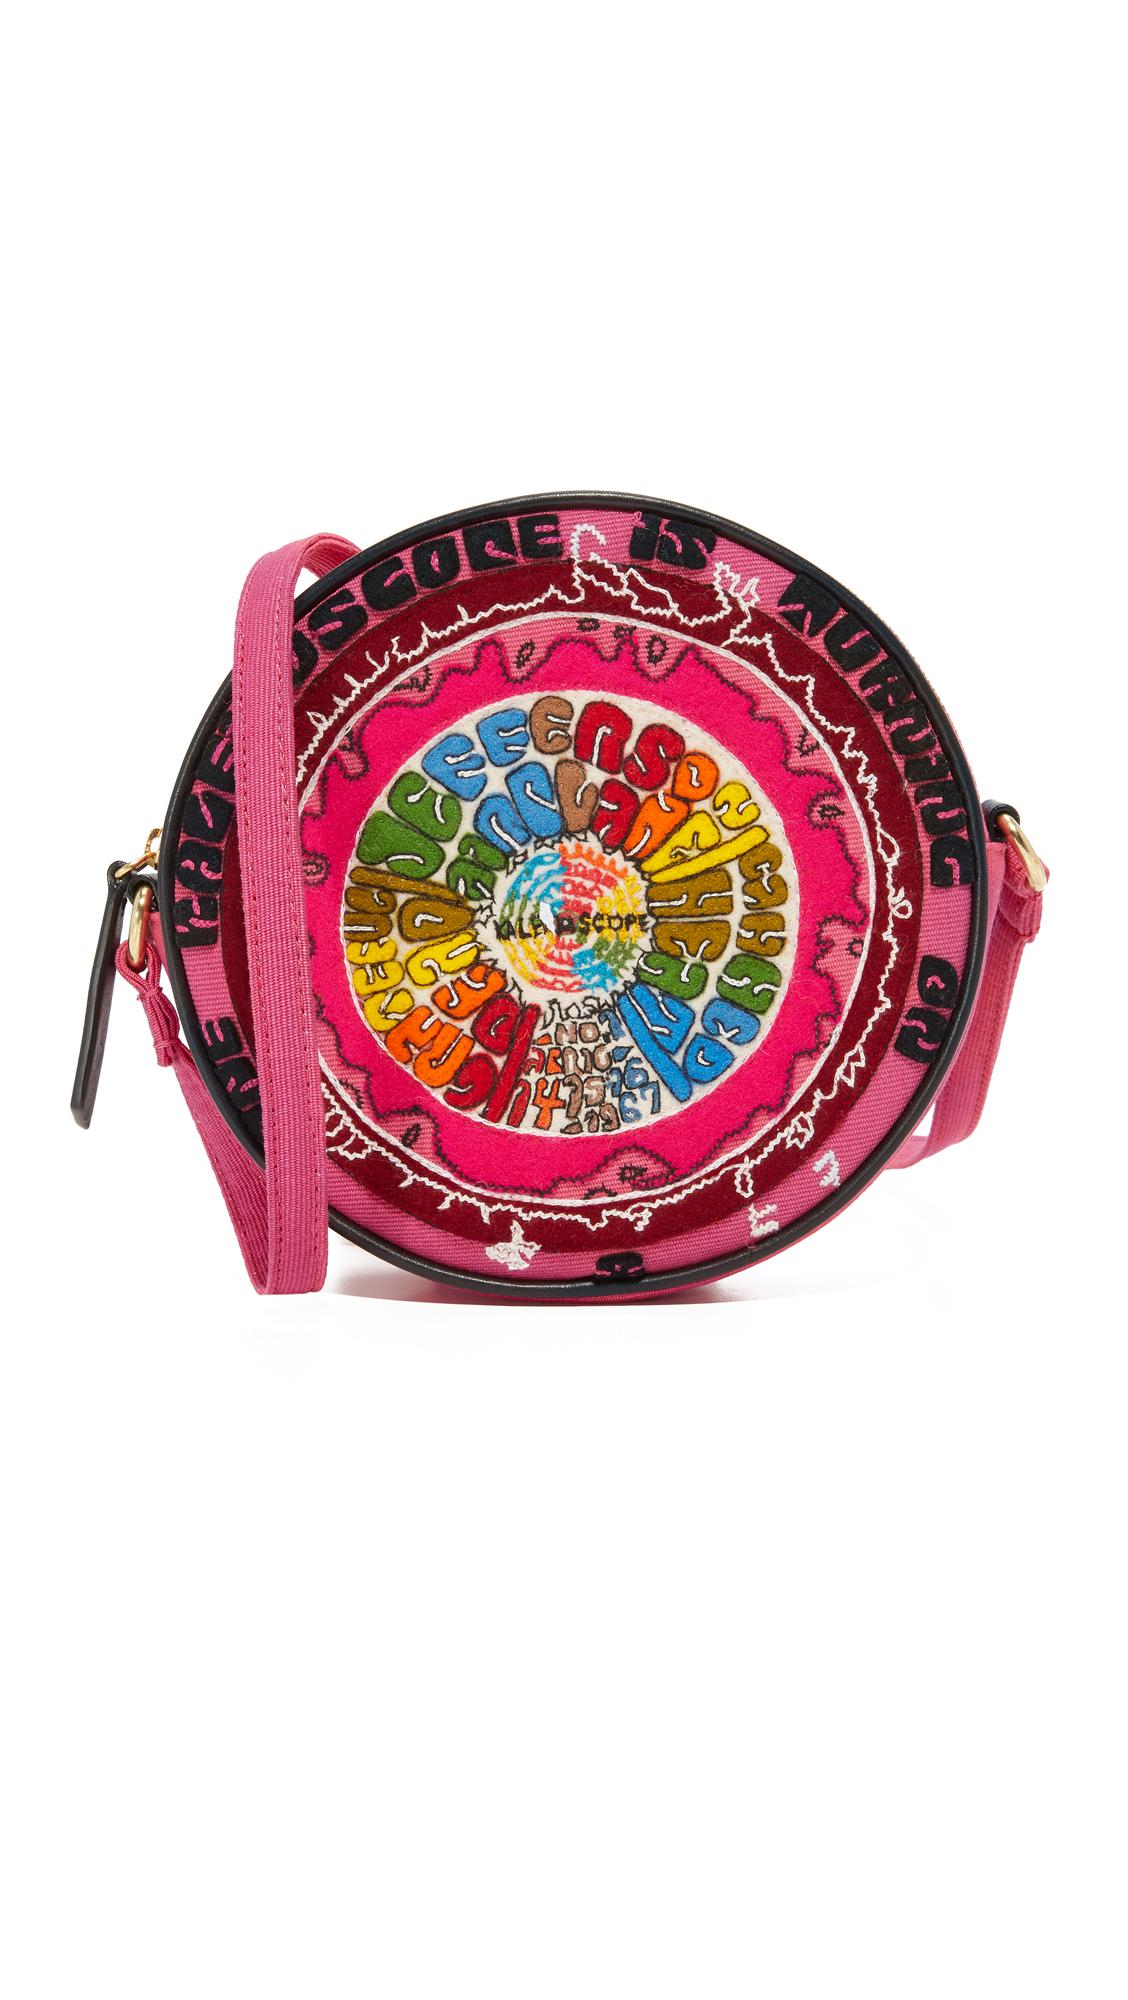 olympia letan female olympia letan the kaleidoscope messenger bag pink